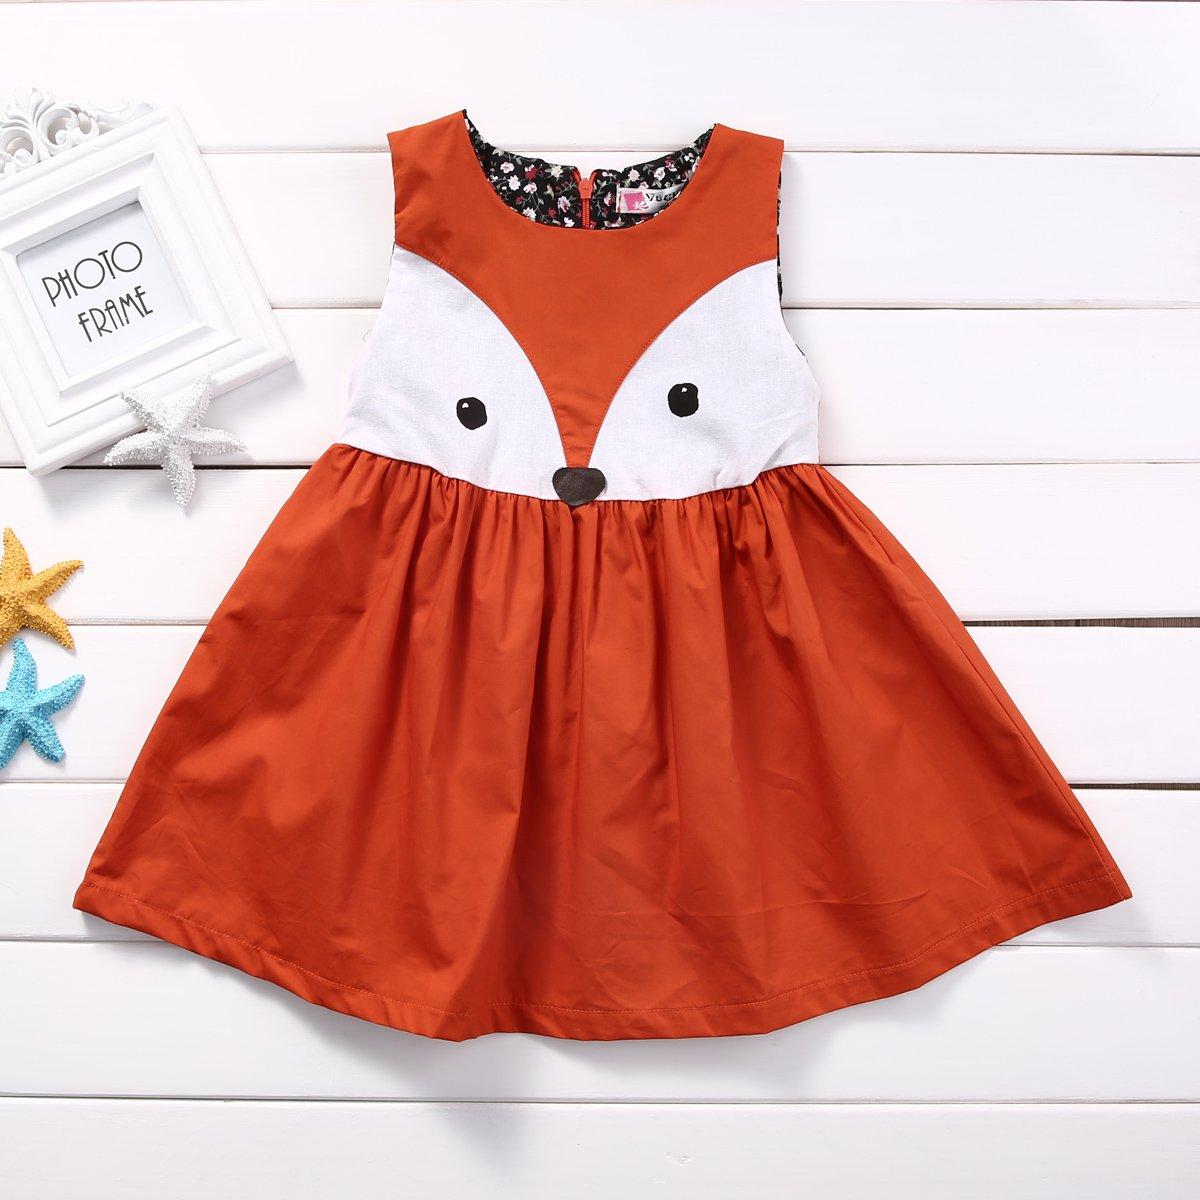 Viclearshop Baby Girls Toddler Kids Fox Dress Party Wedding Tutu Dresses Princess